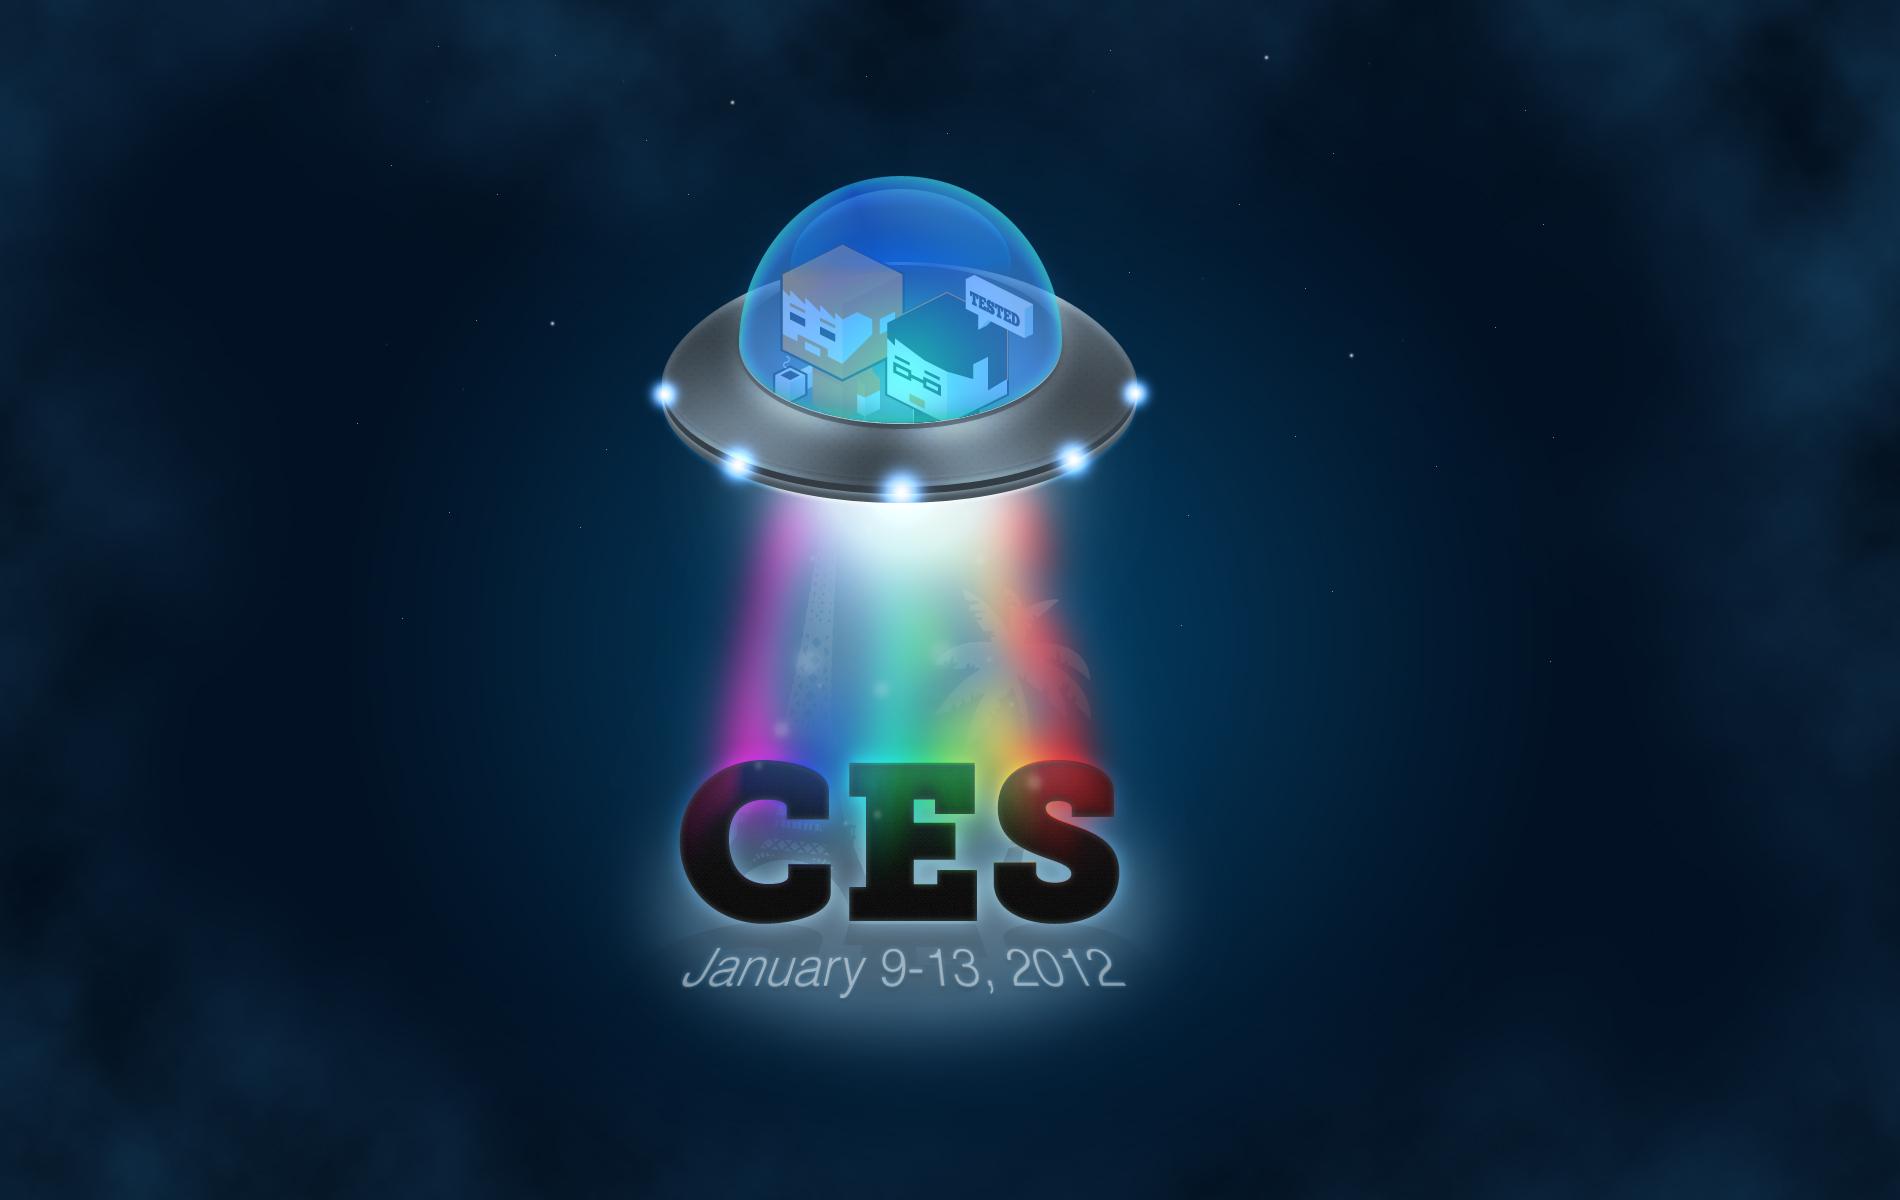 CES (Consumer Electronics Show) 2012